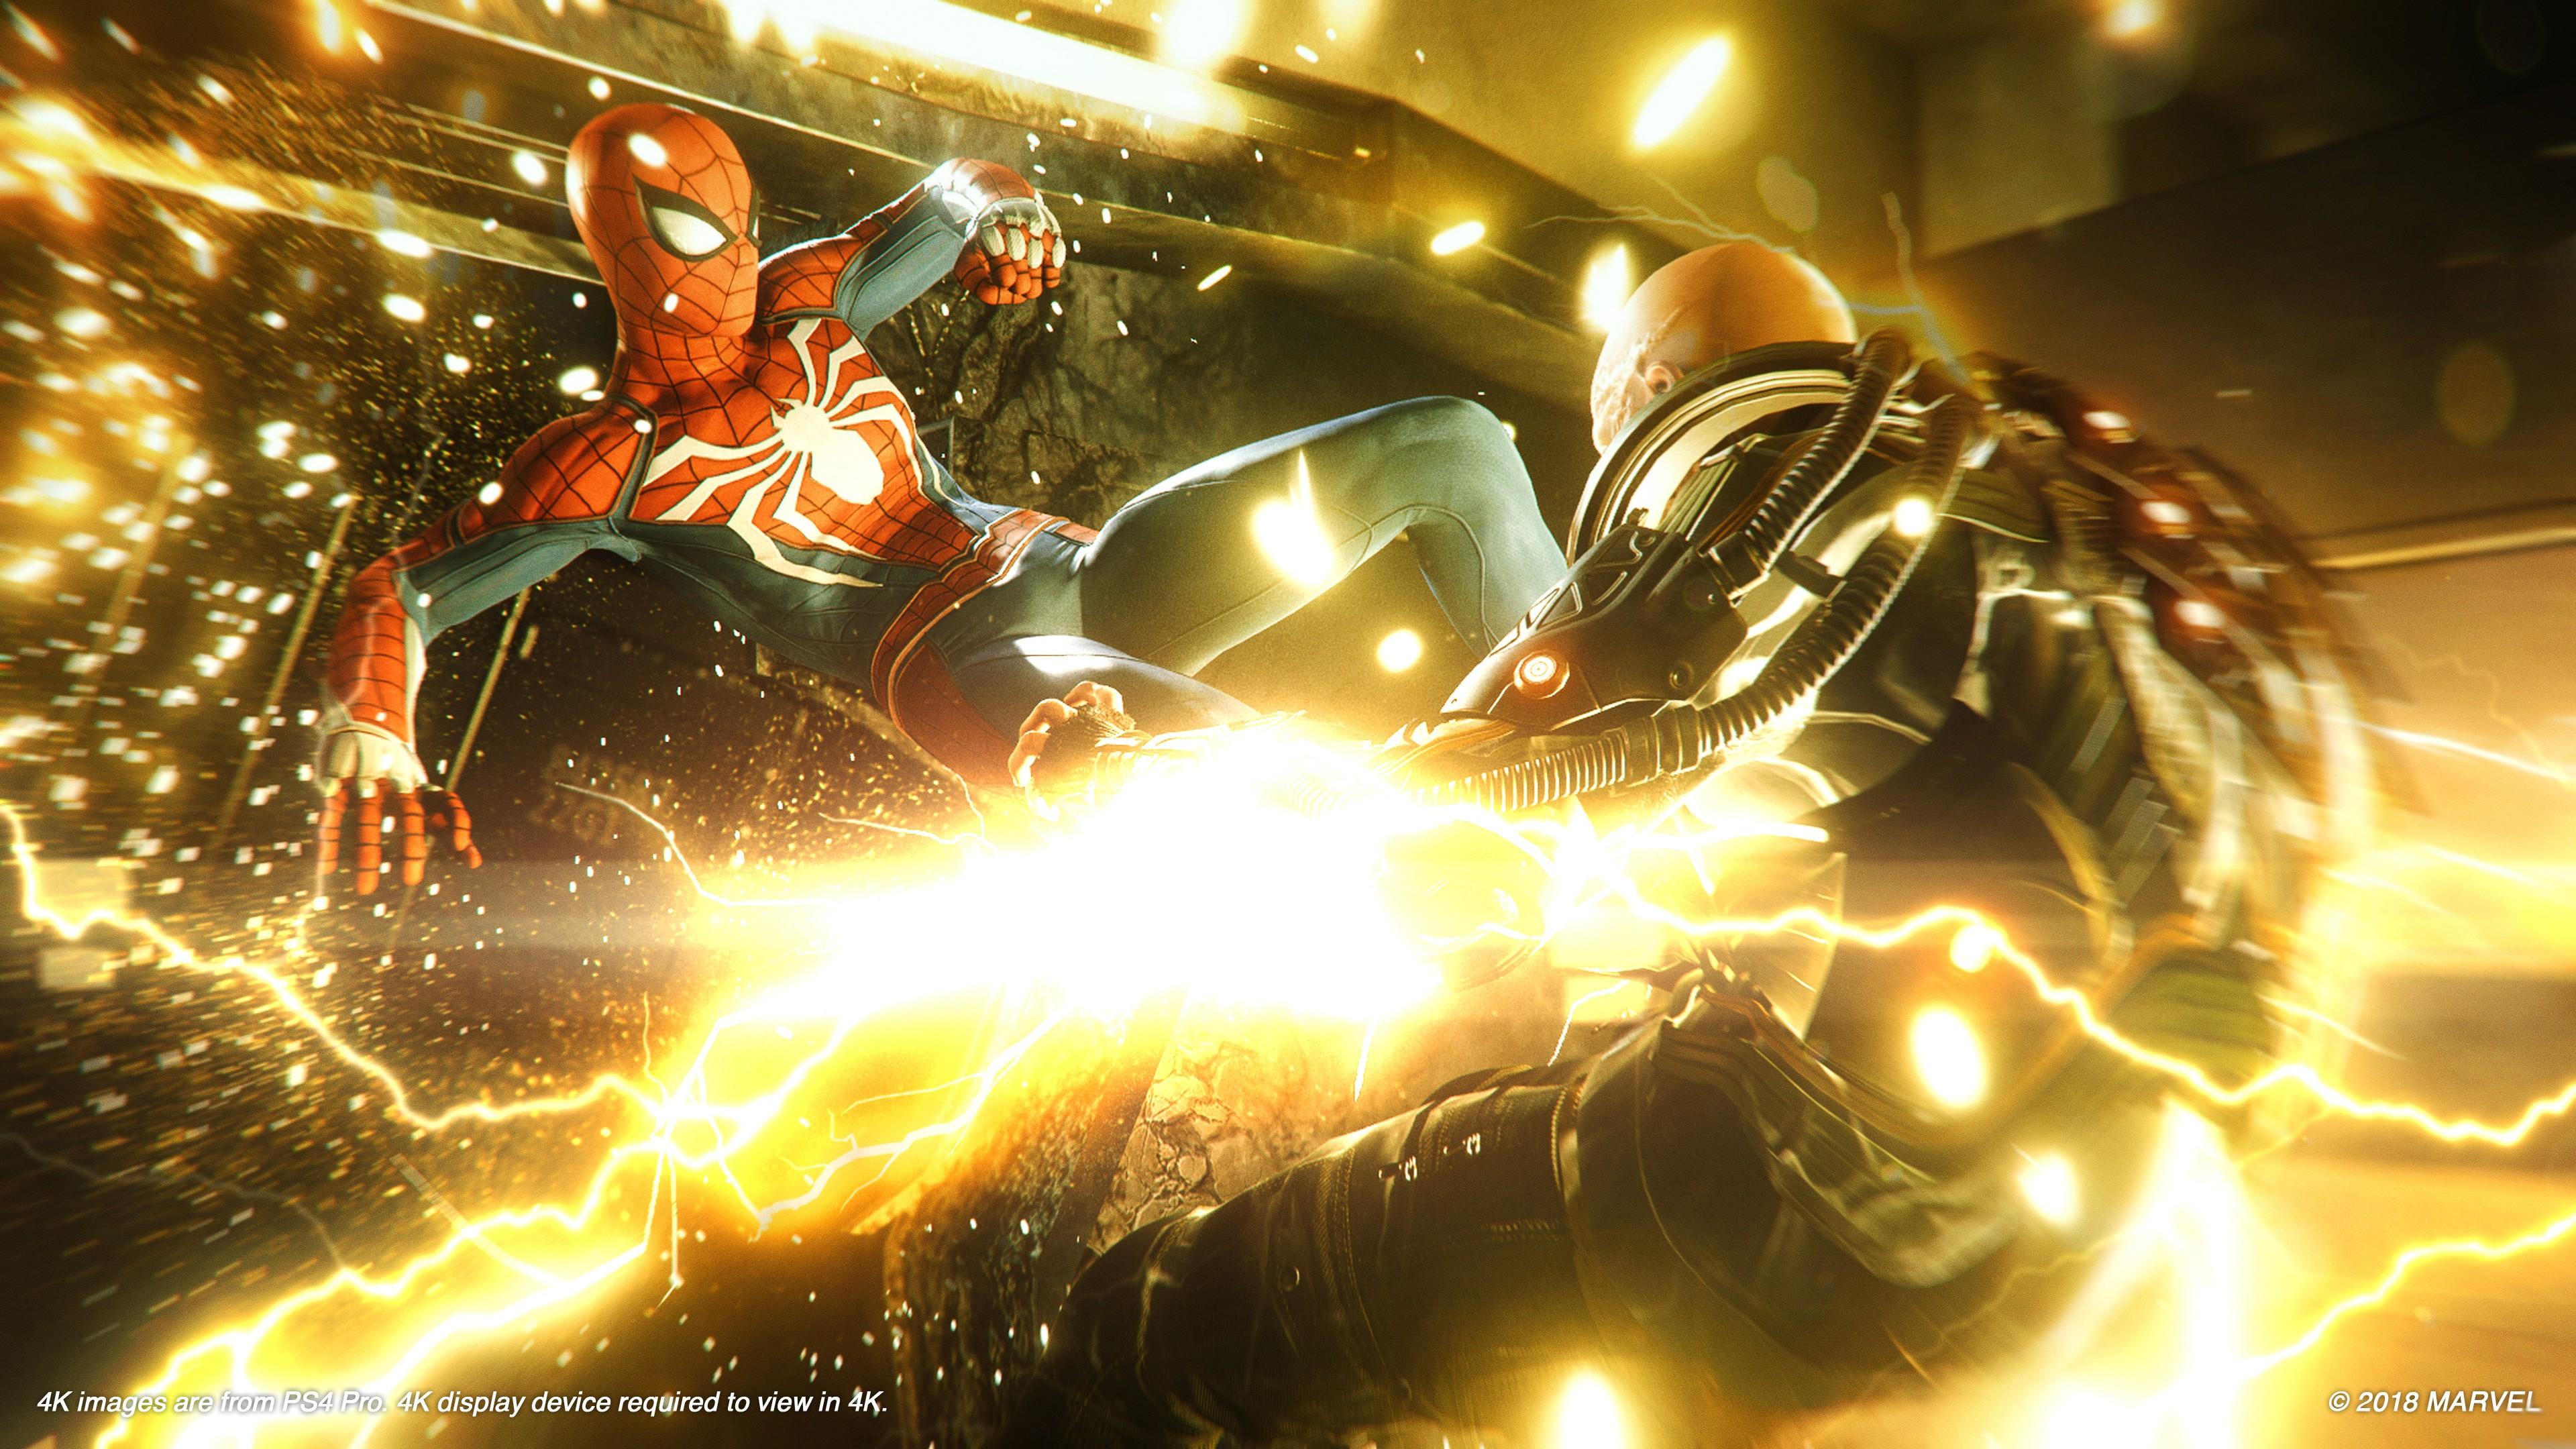 Wallpaper Marvels Spider Man E3 2018 screenshot 4K